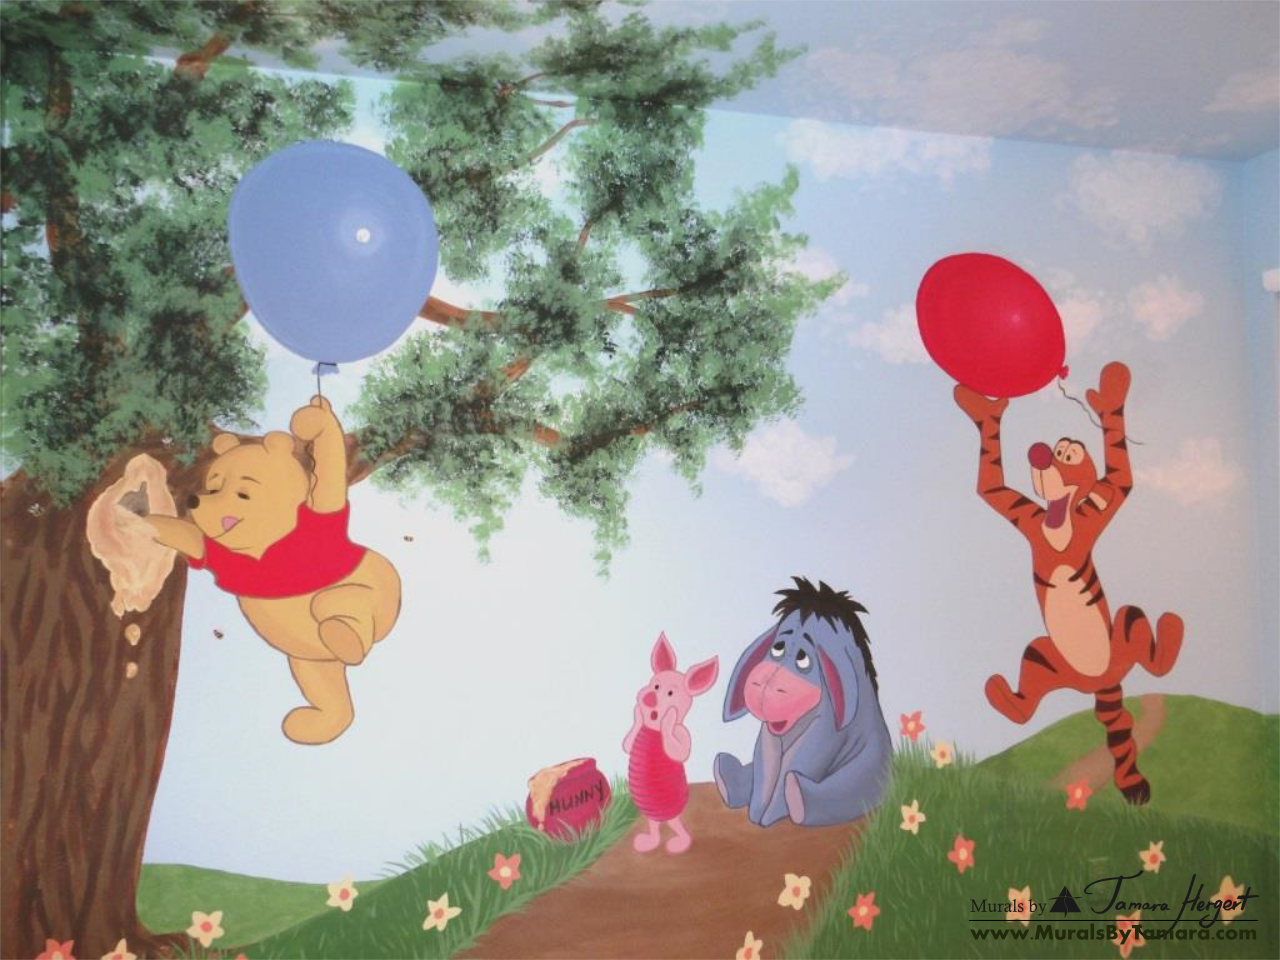 Winnie the Pooh mural Winnie, Piglet and Tigger - kids room mural by Tamara Hergert